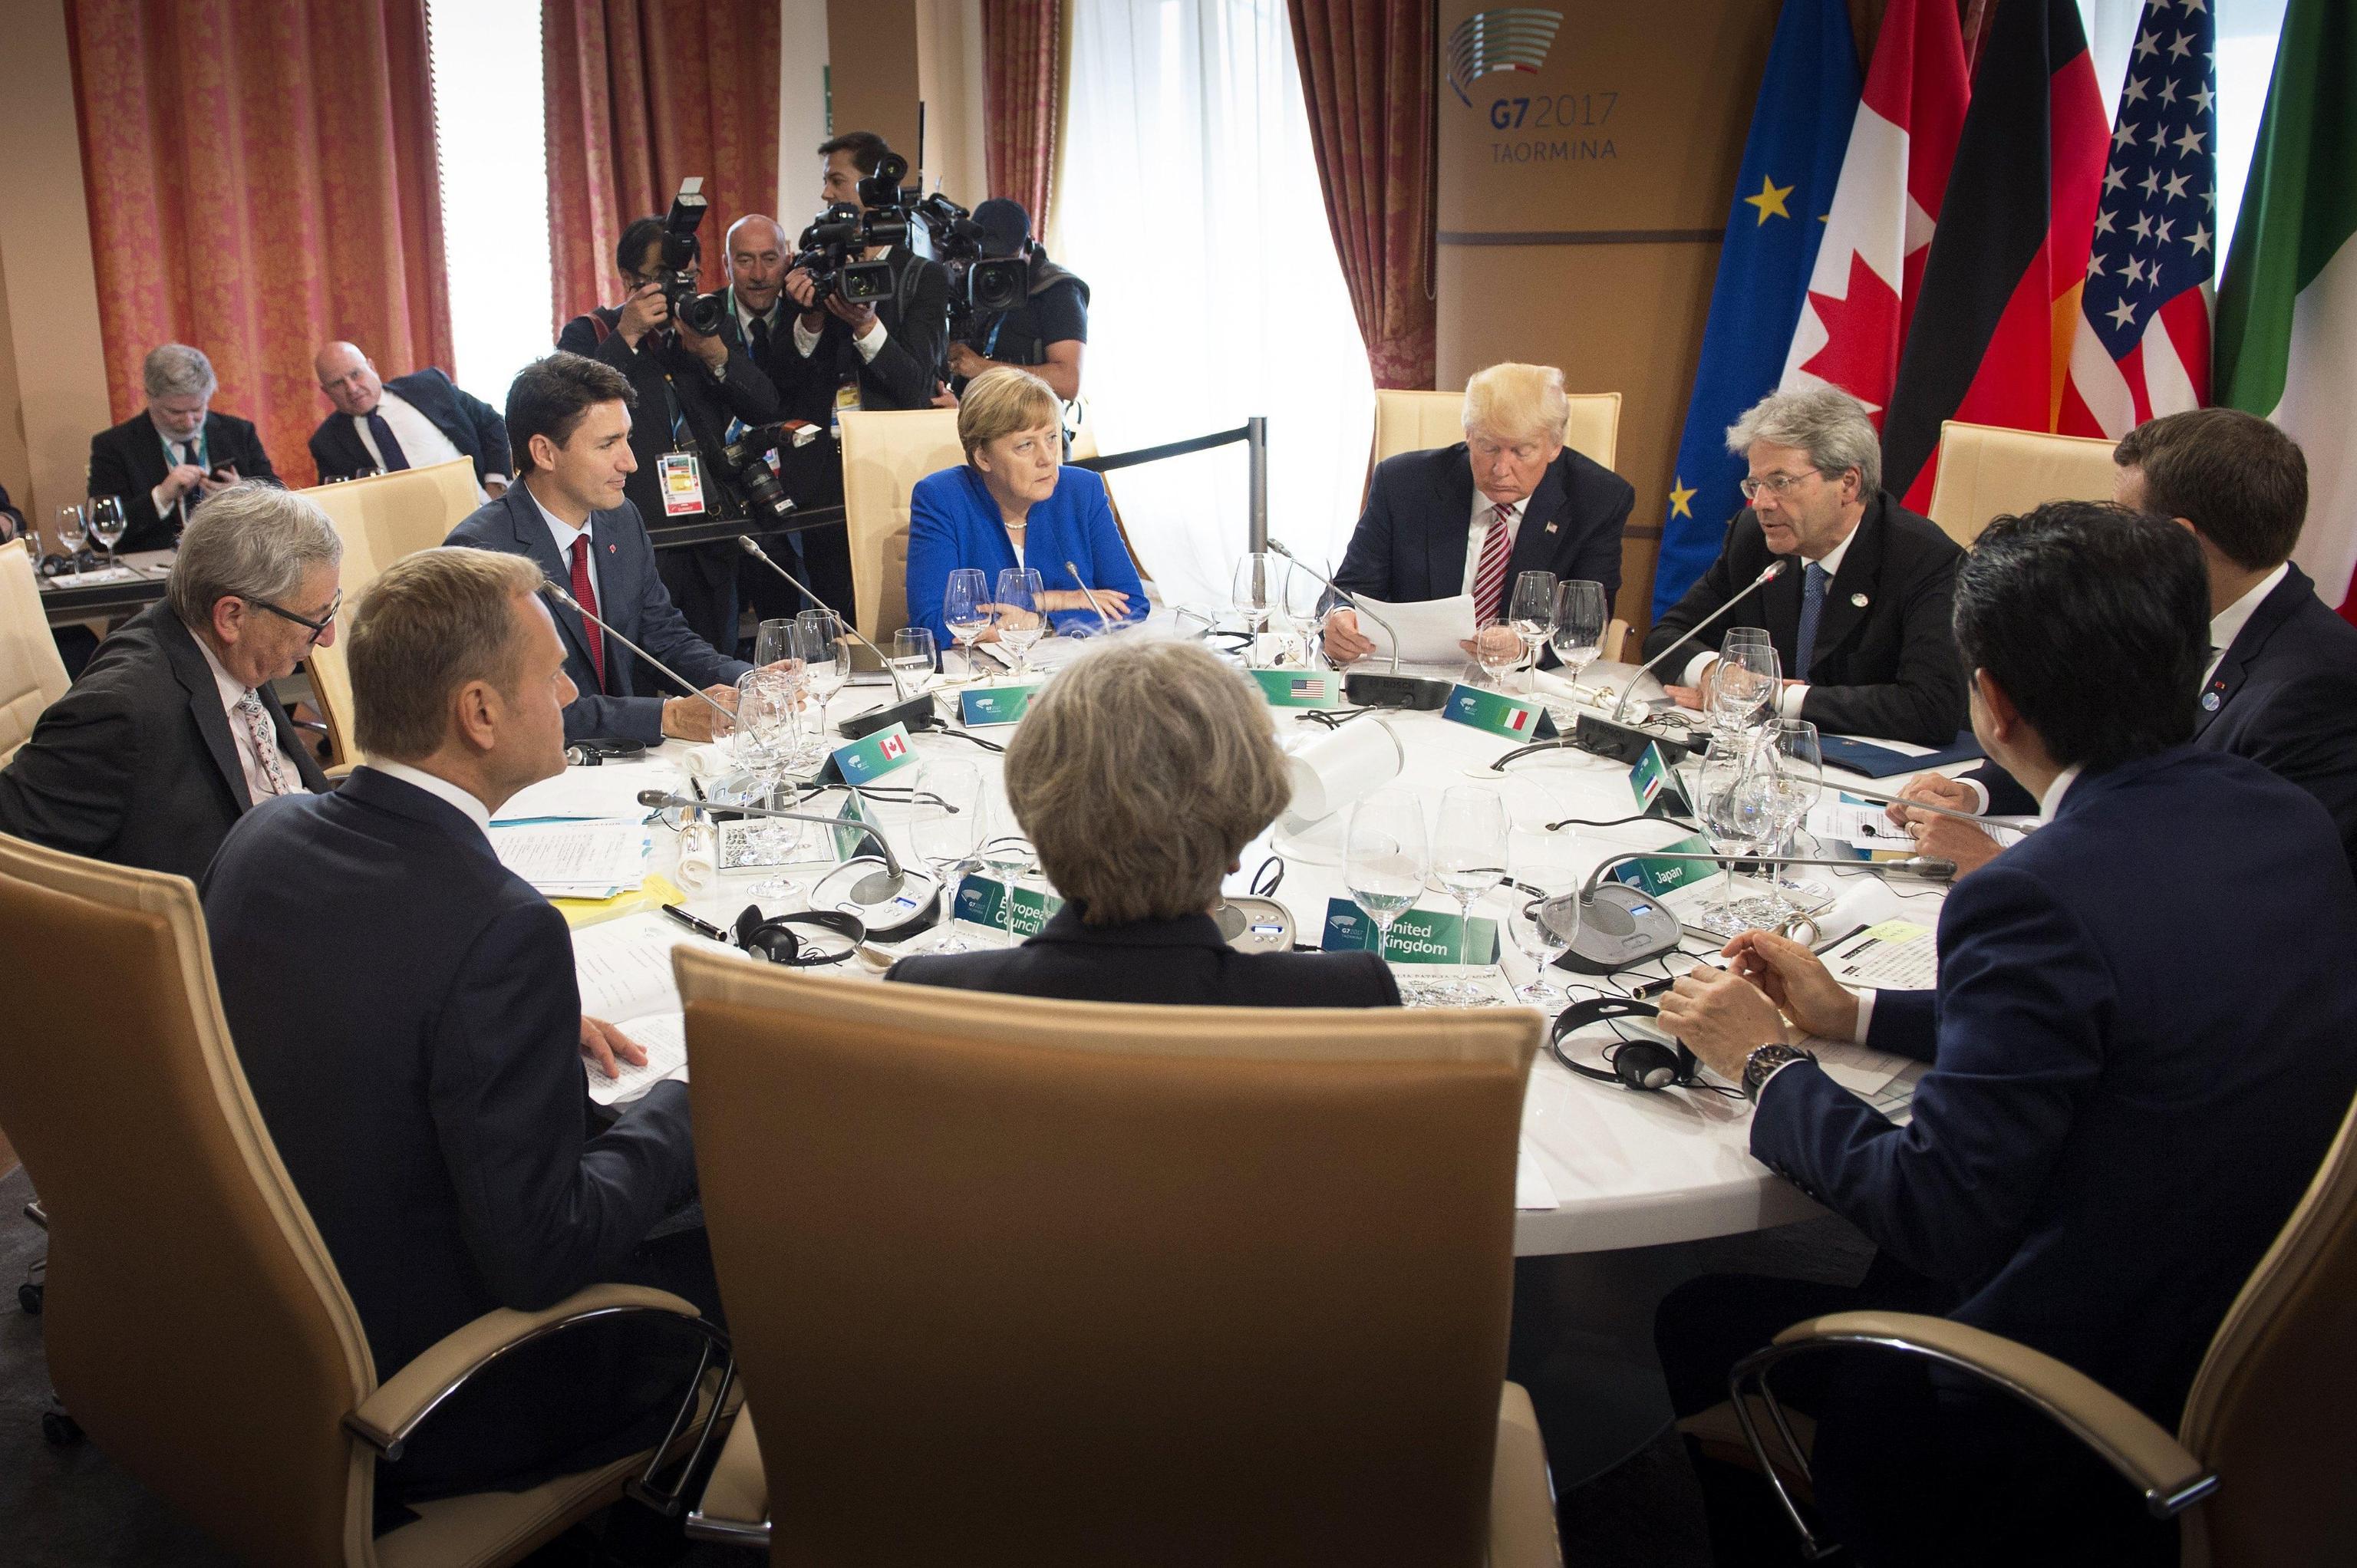 G7 Summit in Taormina